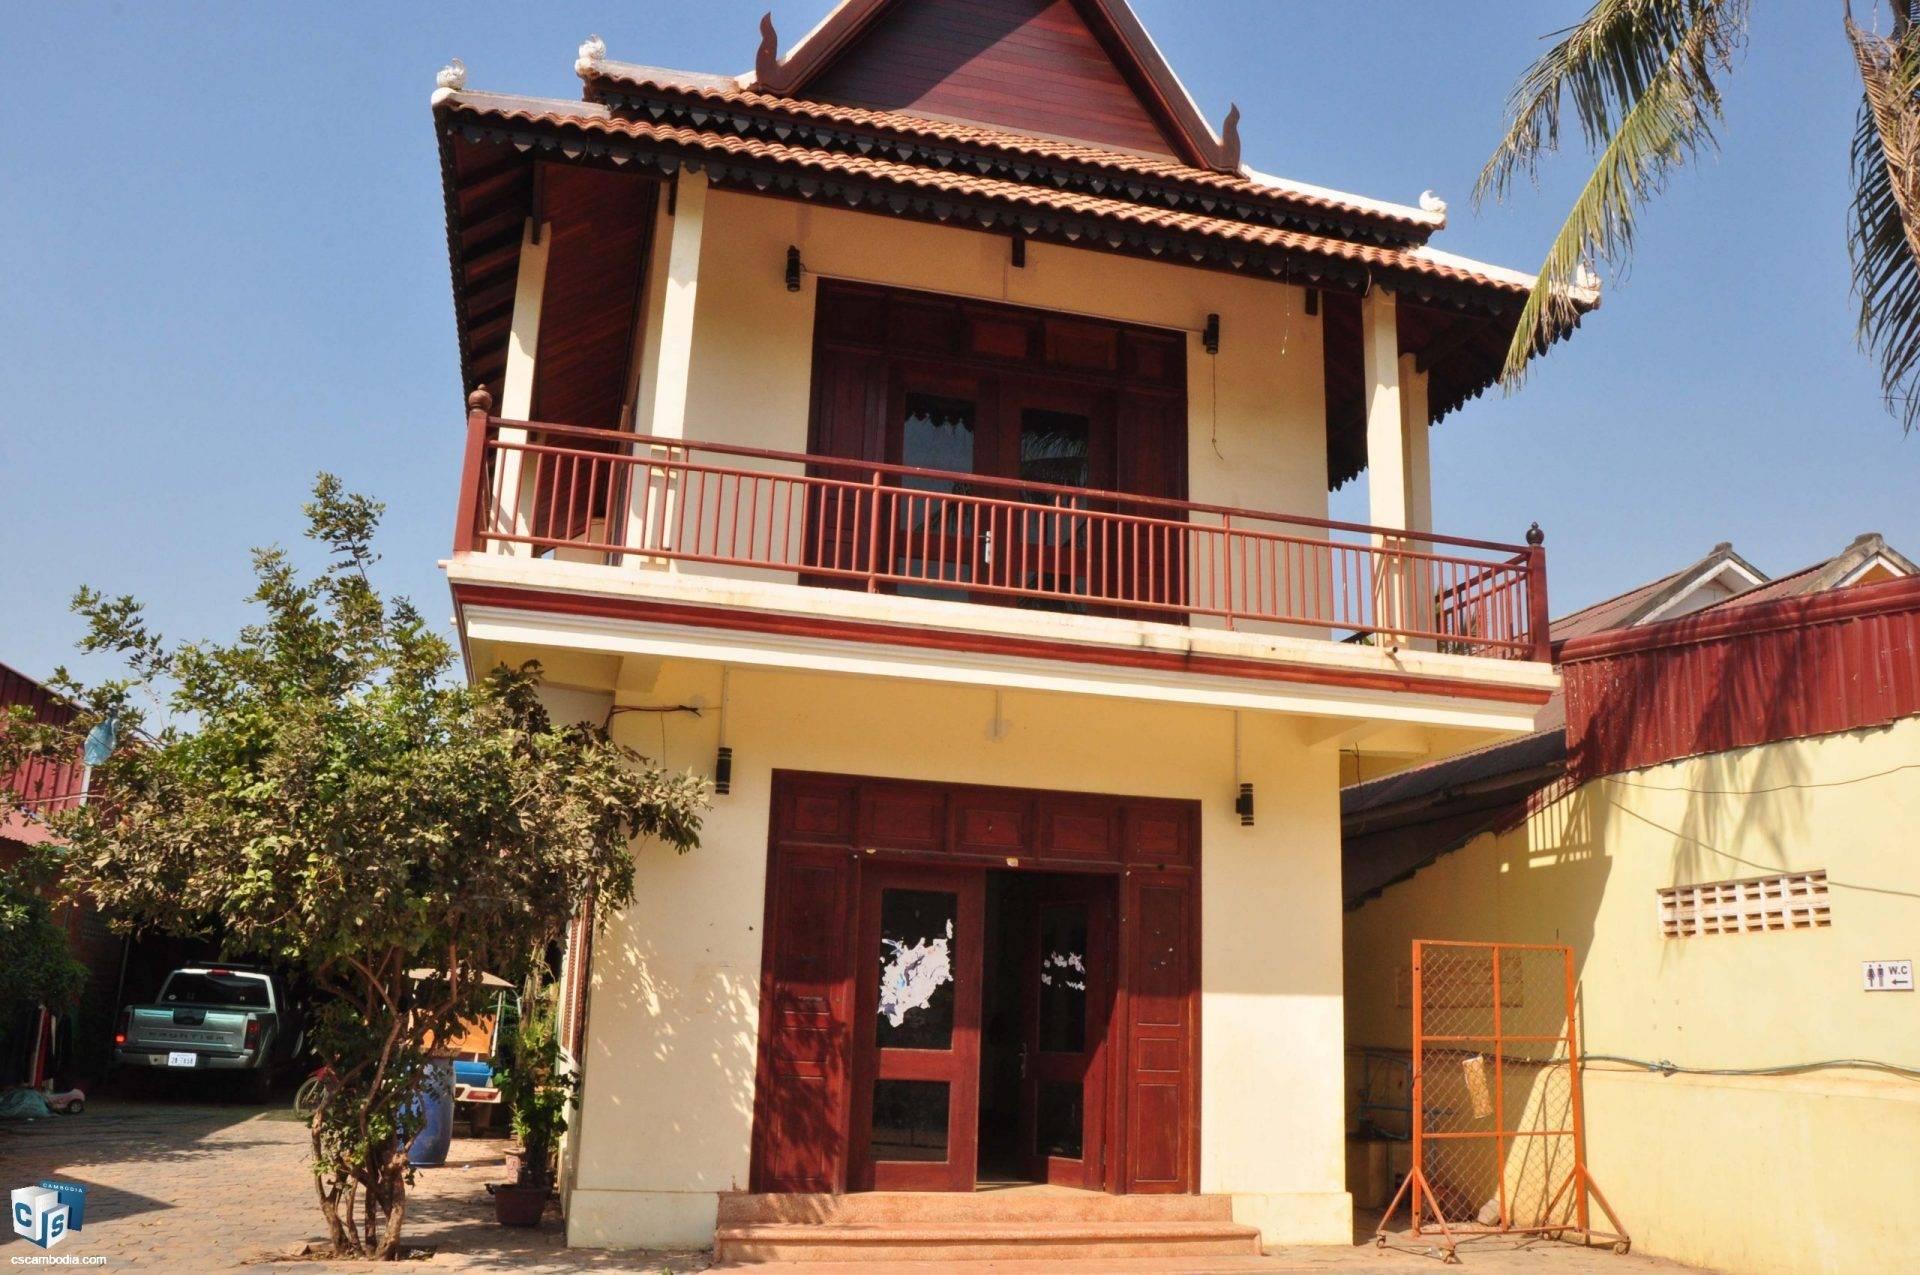 2 Bedroom House- For Rent- Sala Kamreuk Commune, Siem Reap